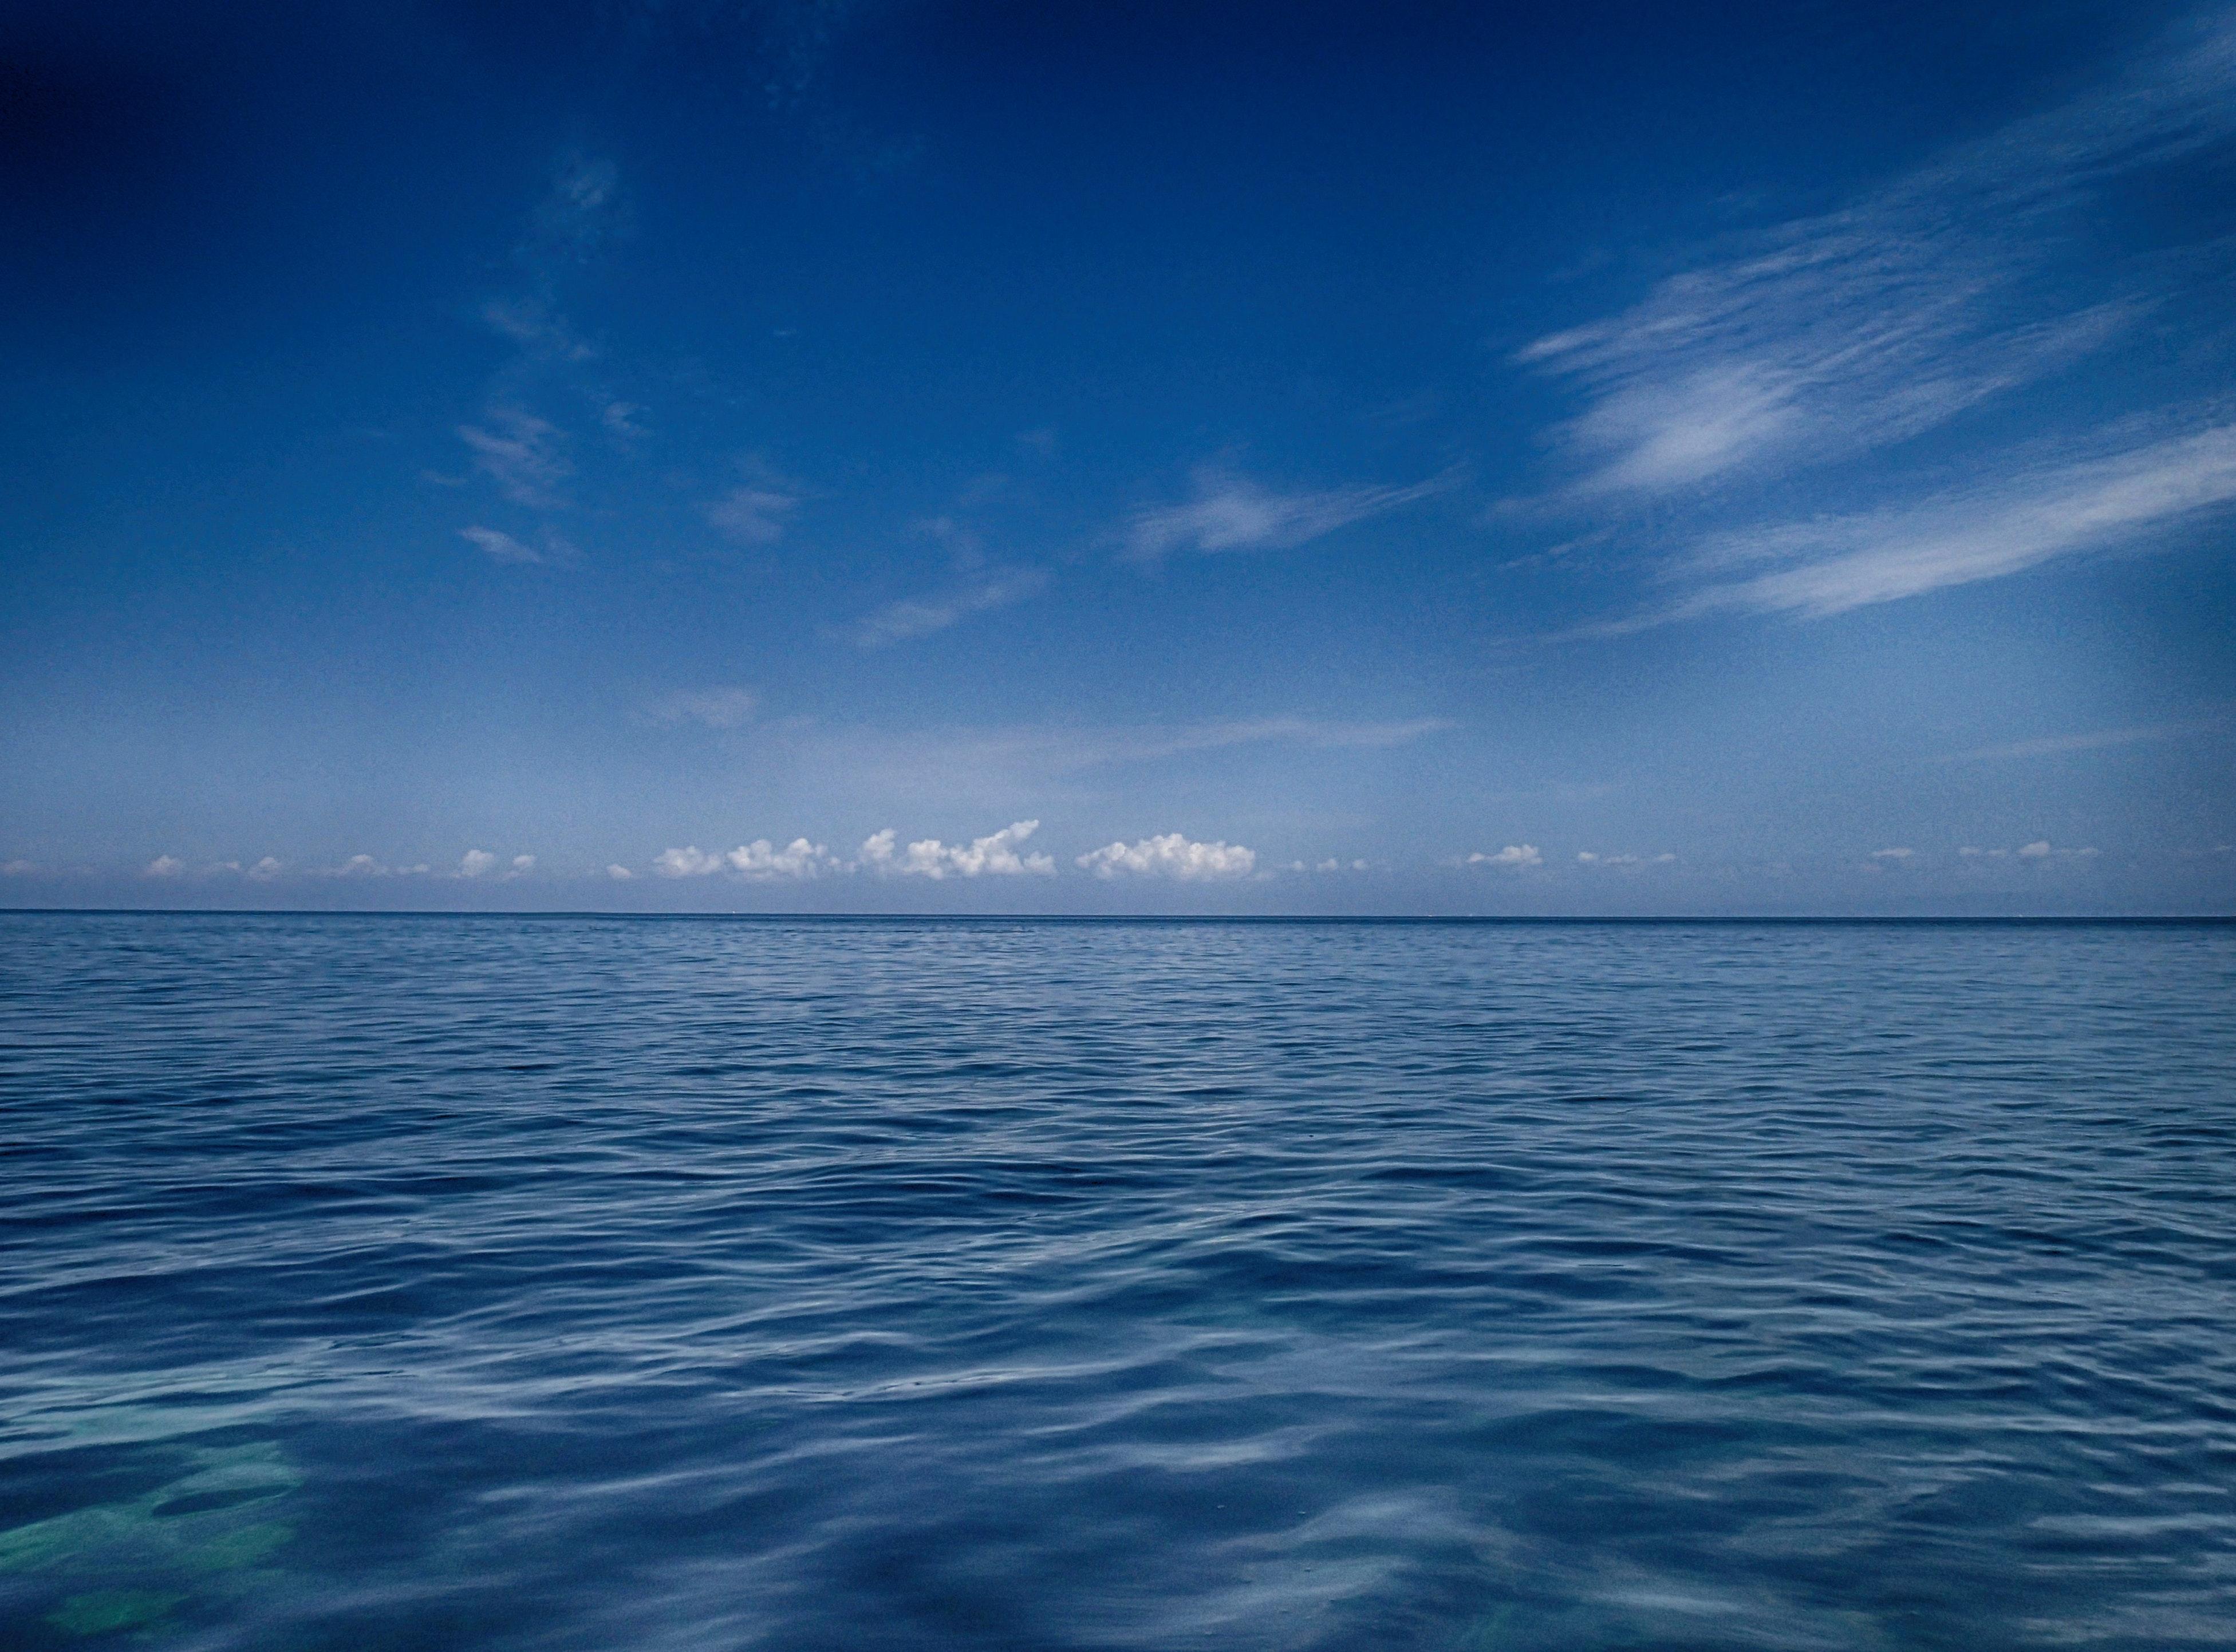 Scenic view of the sea photo